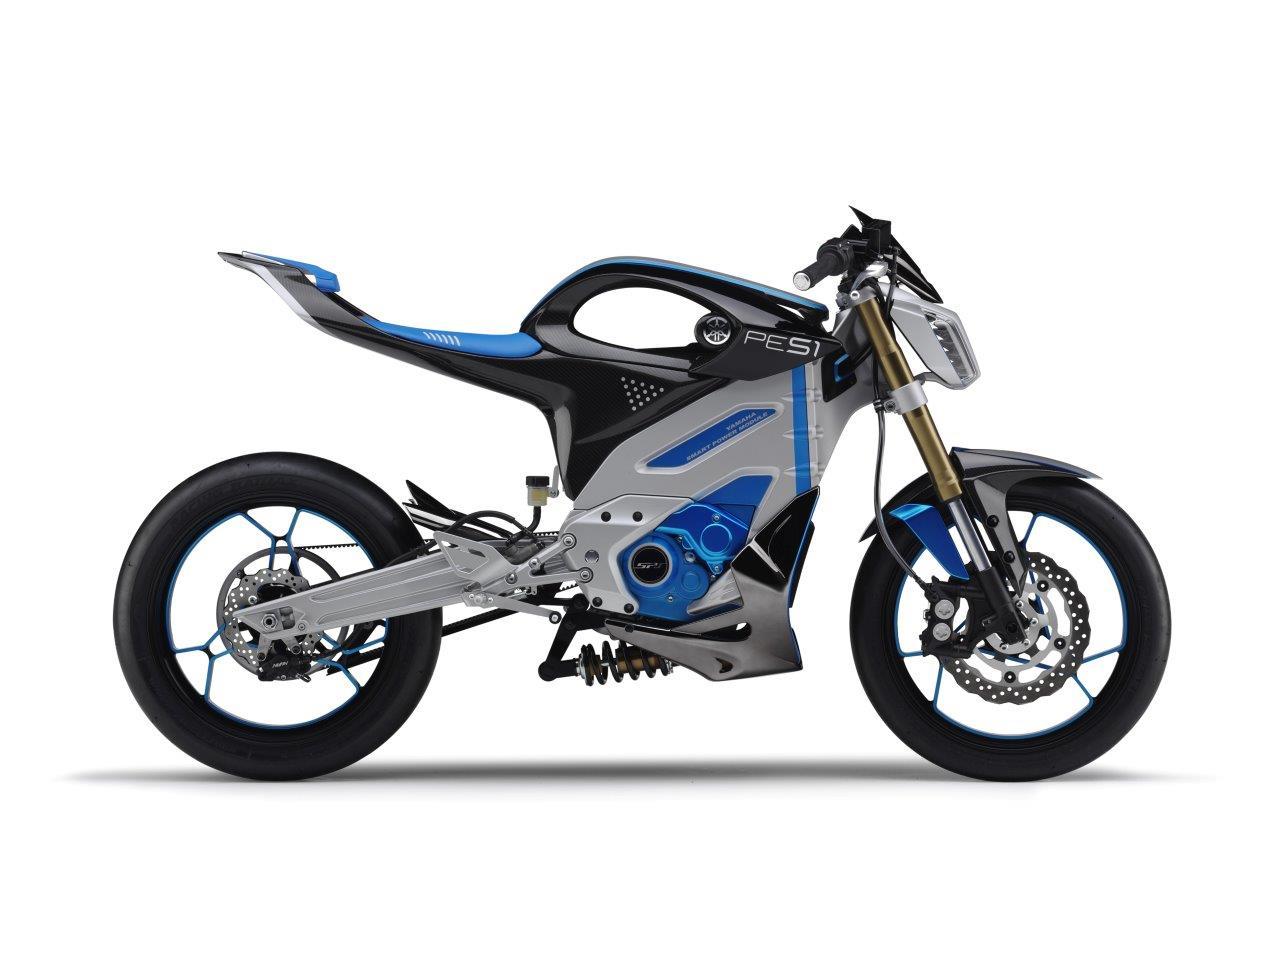 Yamaha to produce PES1 electric sports bike and PED1 dirt bike